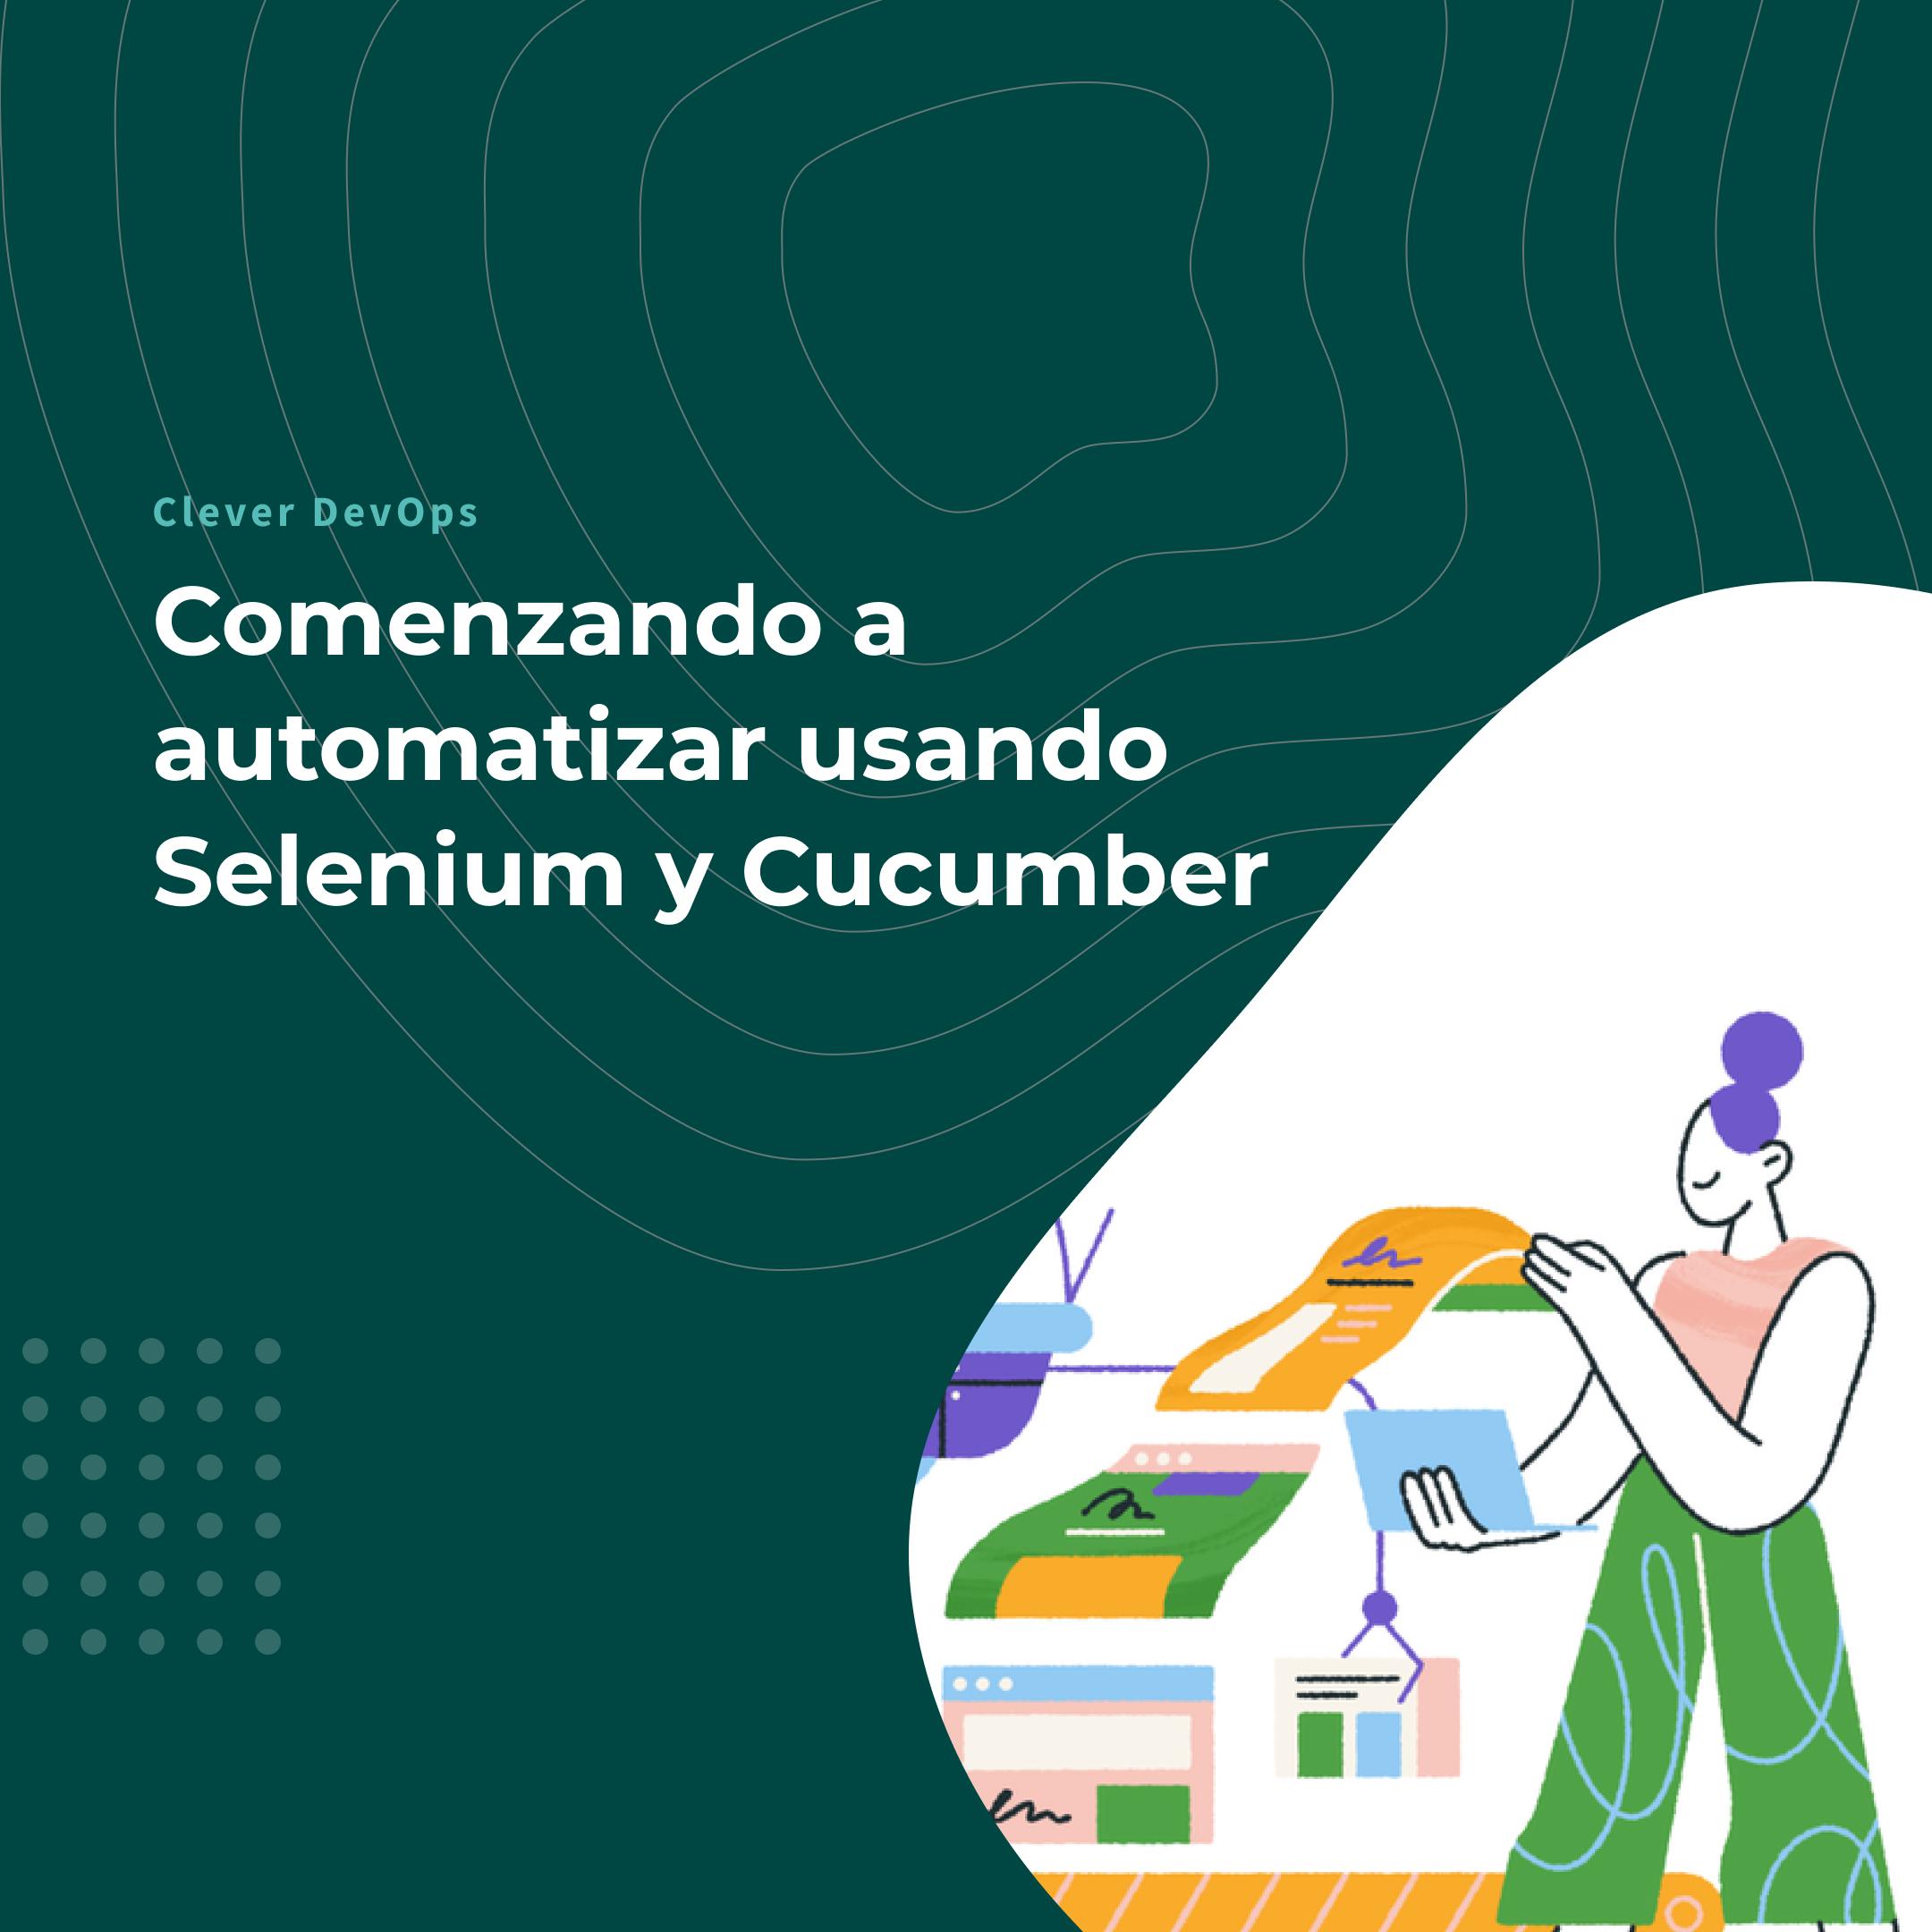 Comenzando a automatizar usando Selenium y Cucumber